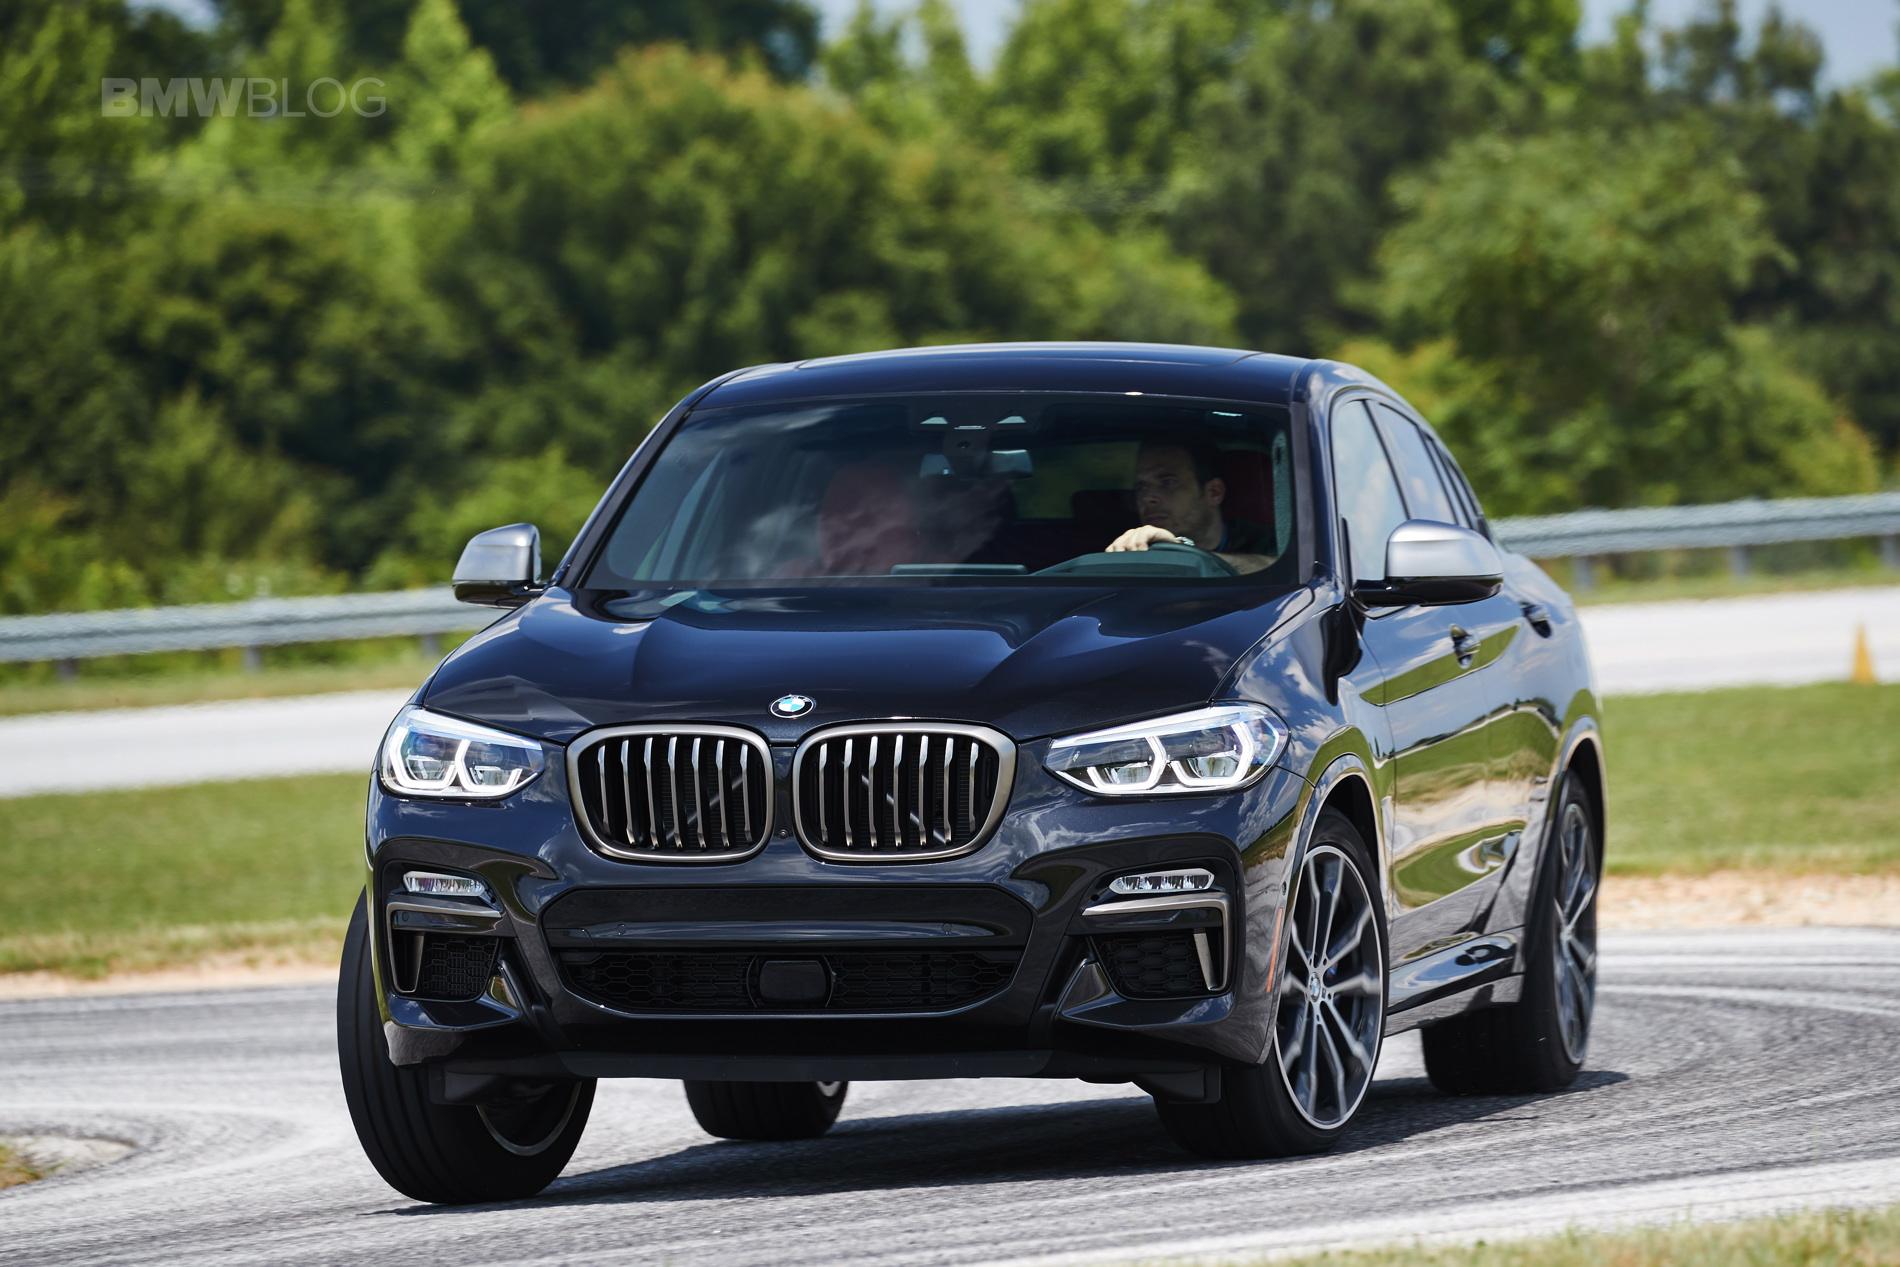 2019 G02 BMW X4 M40i track 04